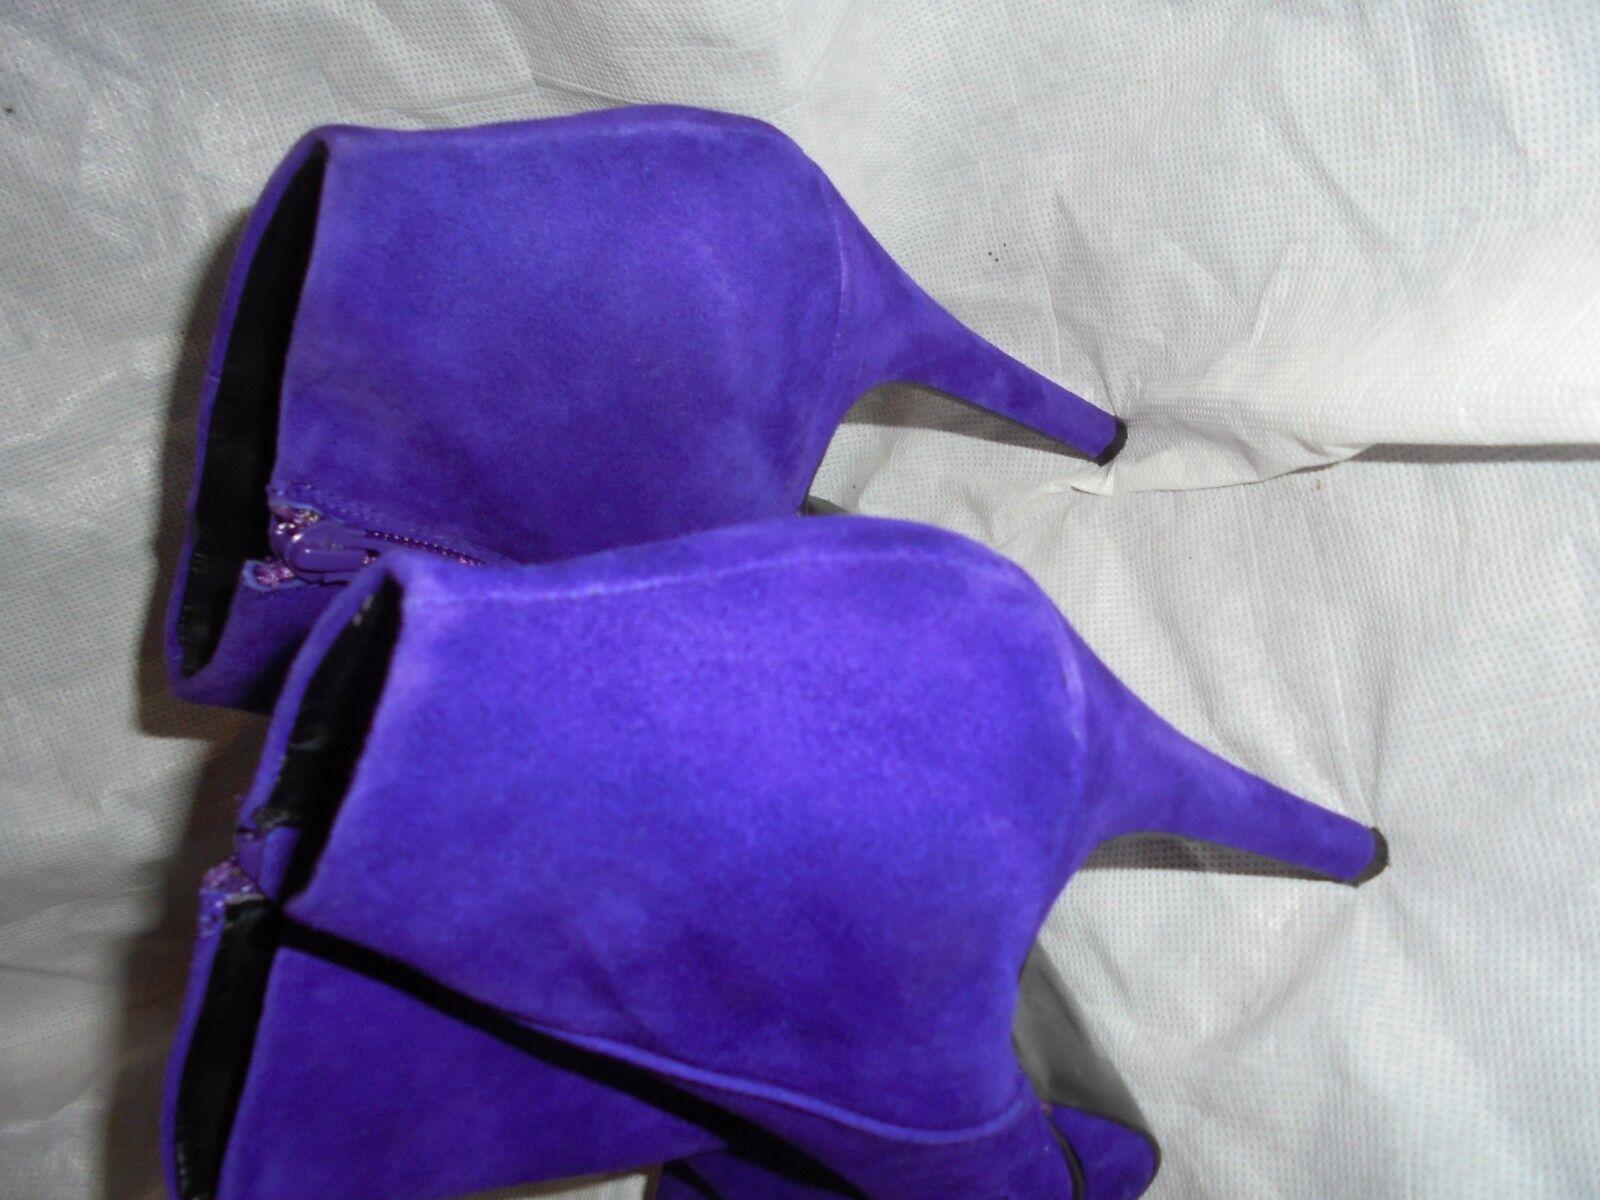 Oficina Para mujeres Cuero Cremallera Gamuza Índigo Cremallera Cuero Botín Talla UK 5 EU 38 en muy buena condición 19a945